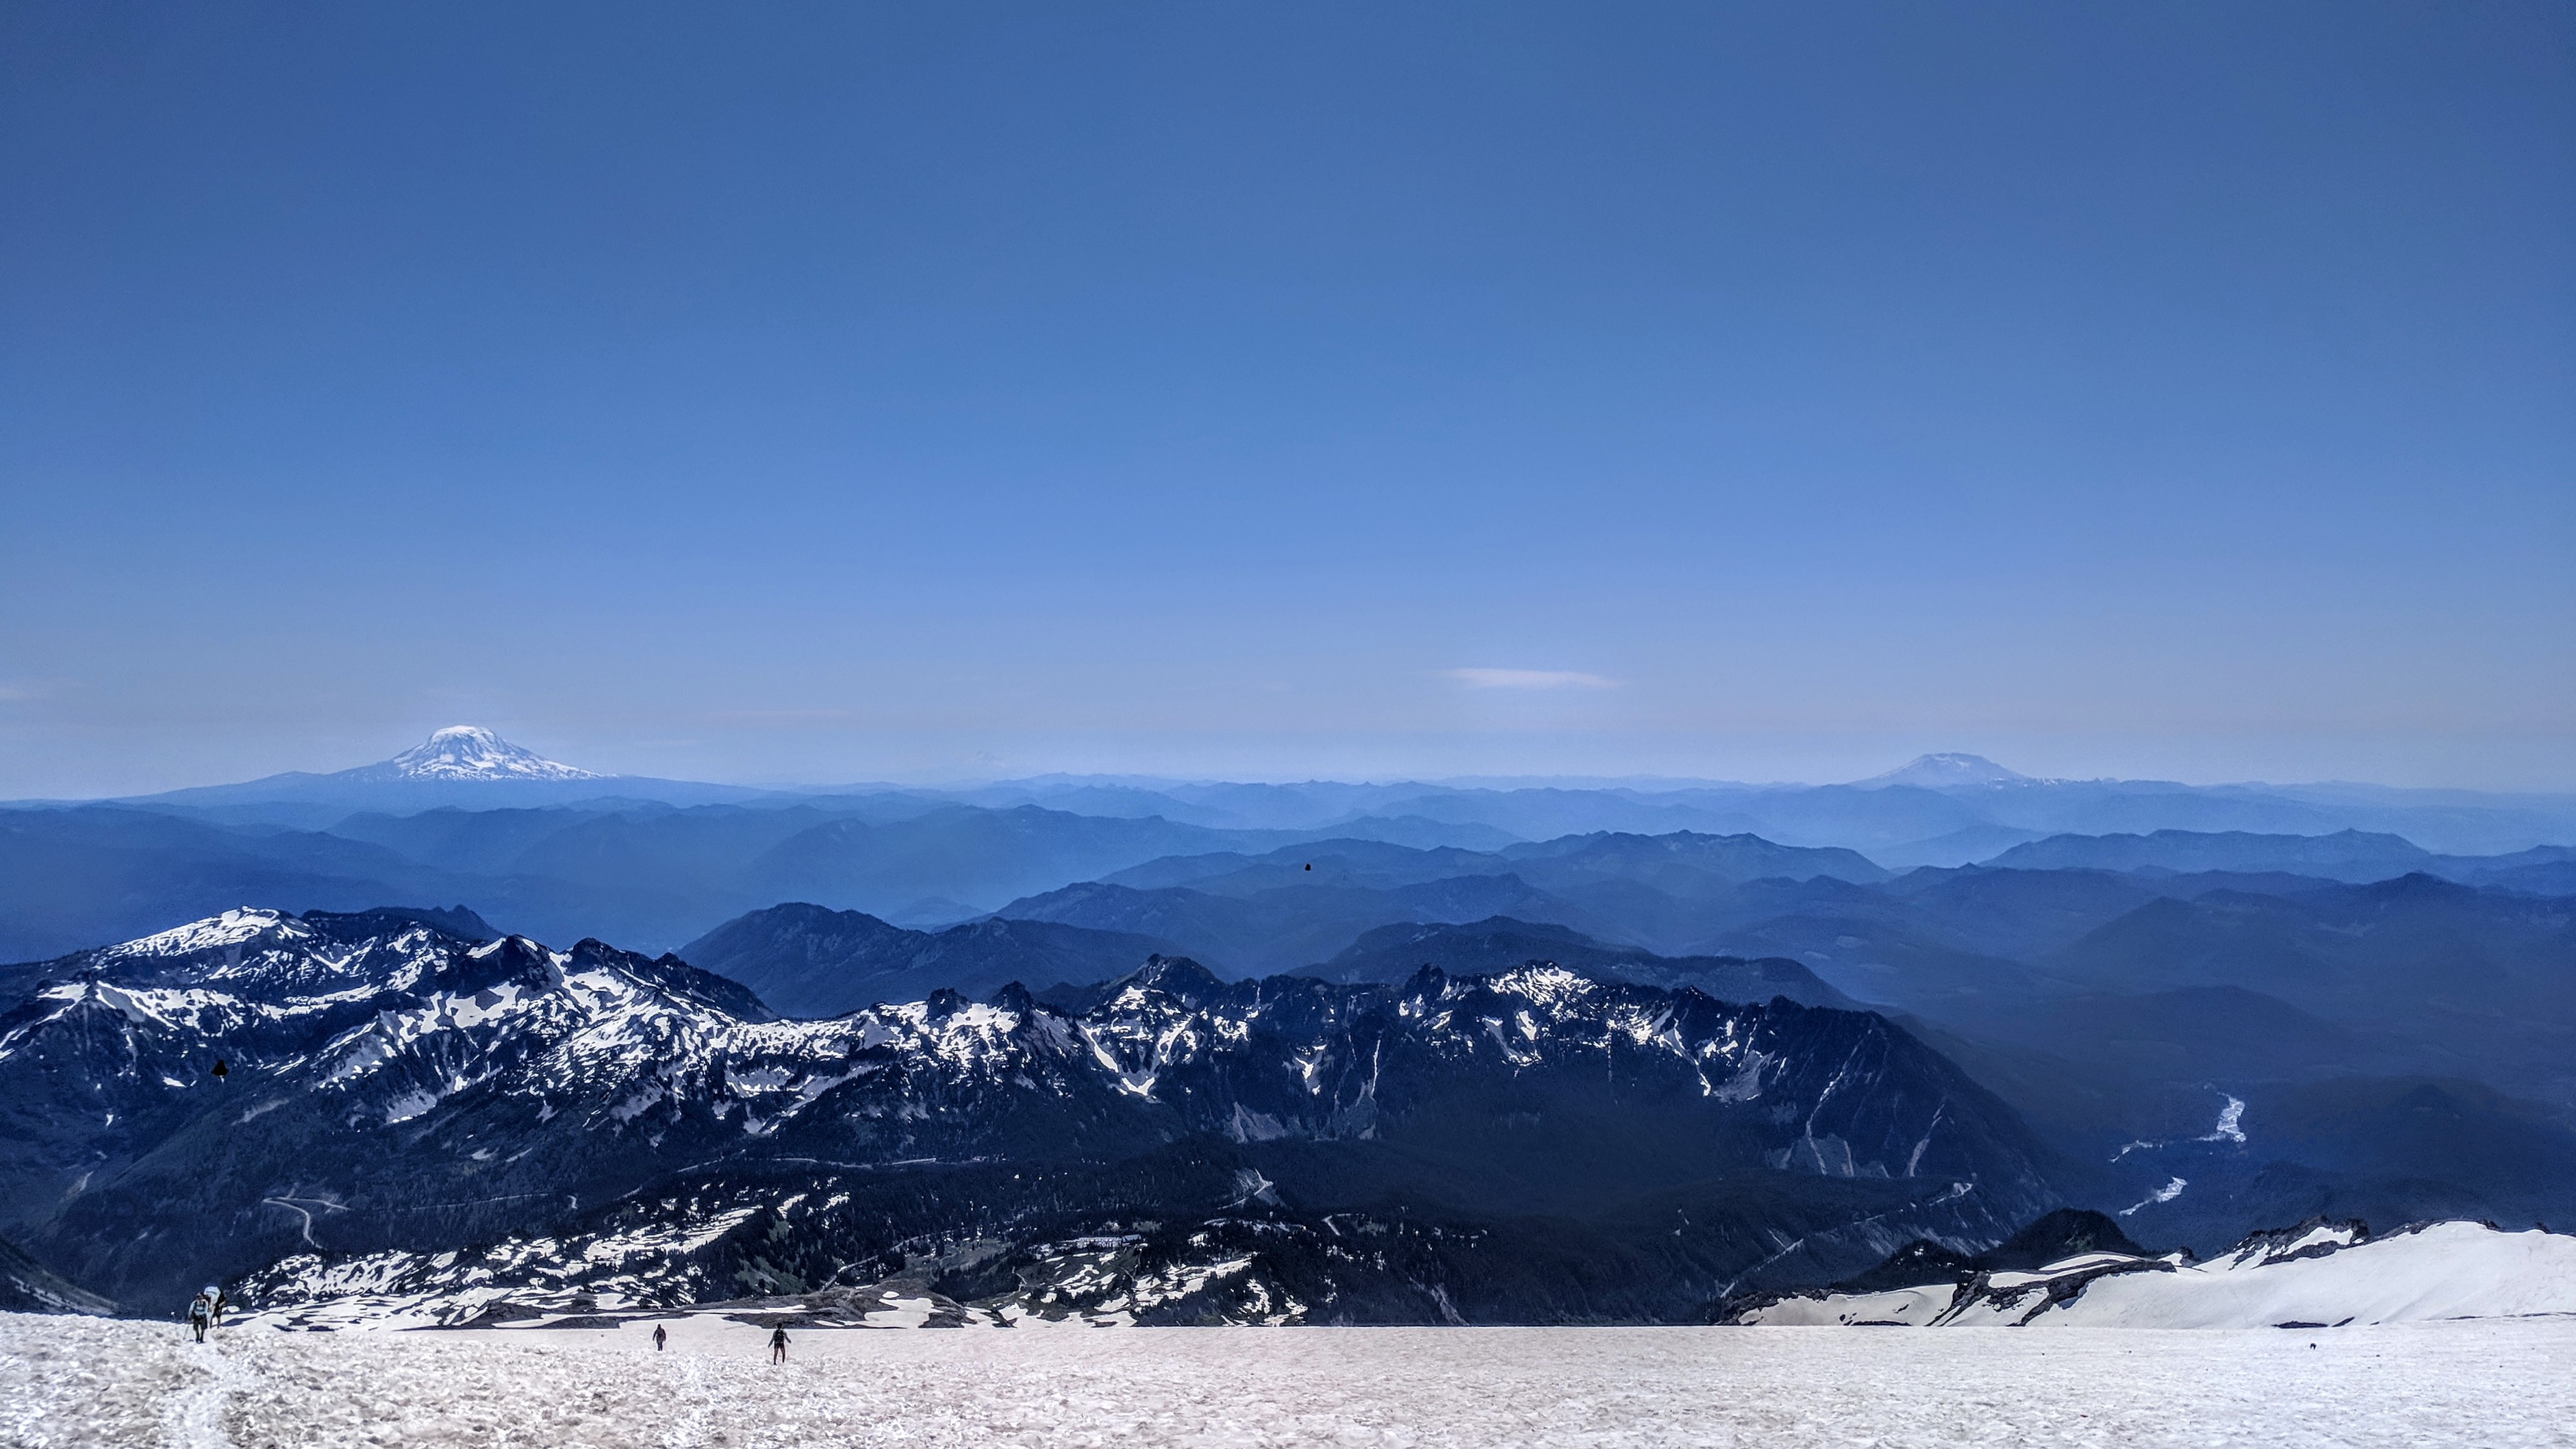 training-pct-summit-camp-muir-mount-rainier